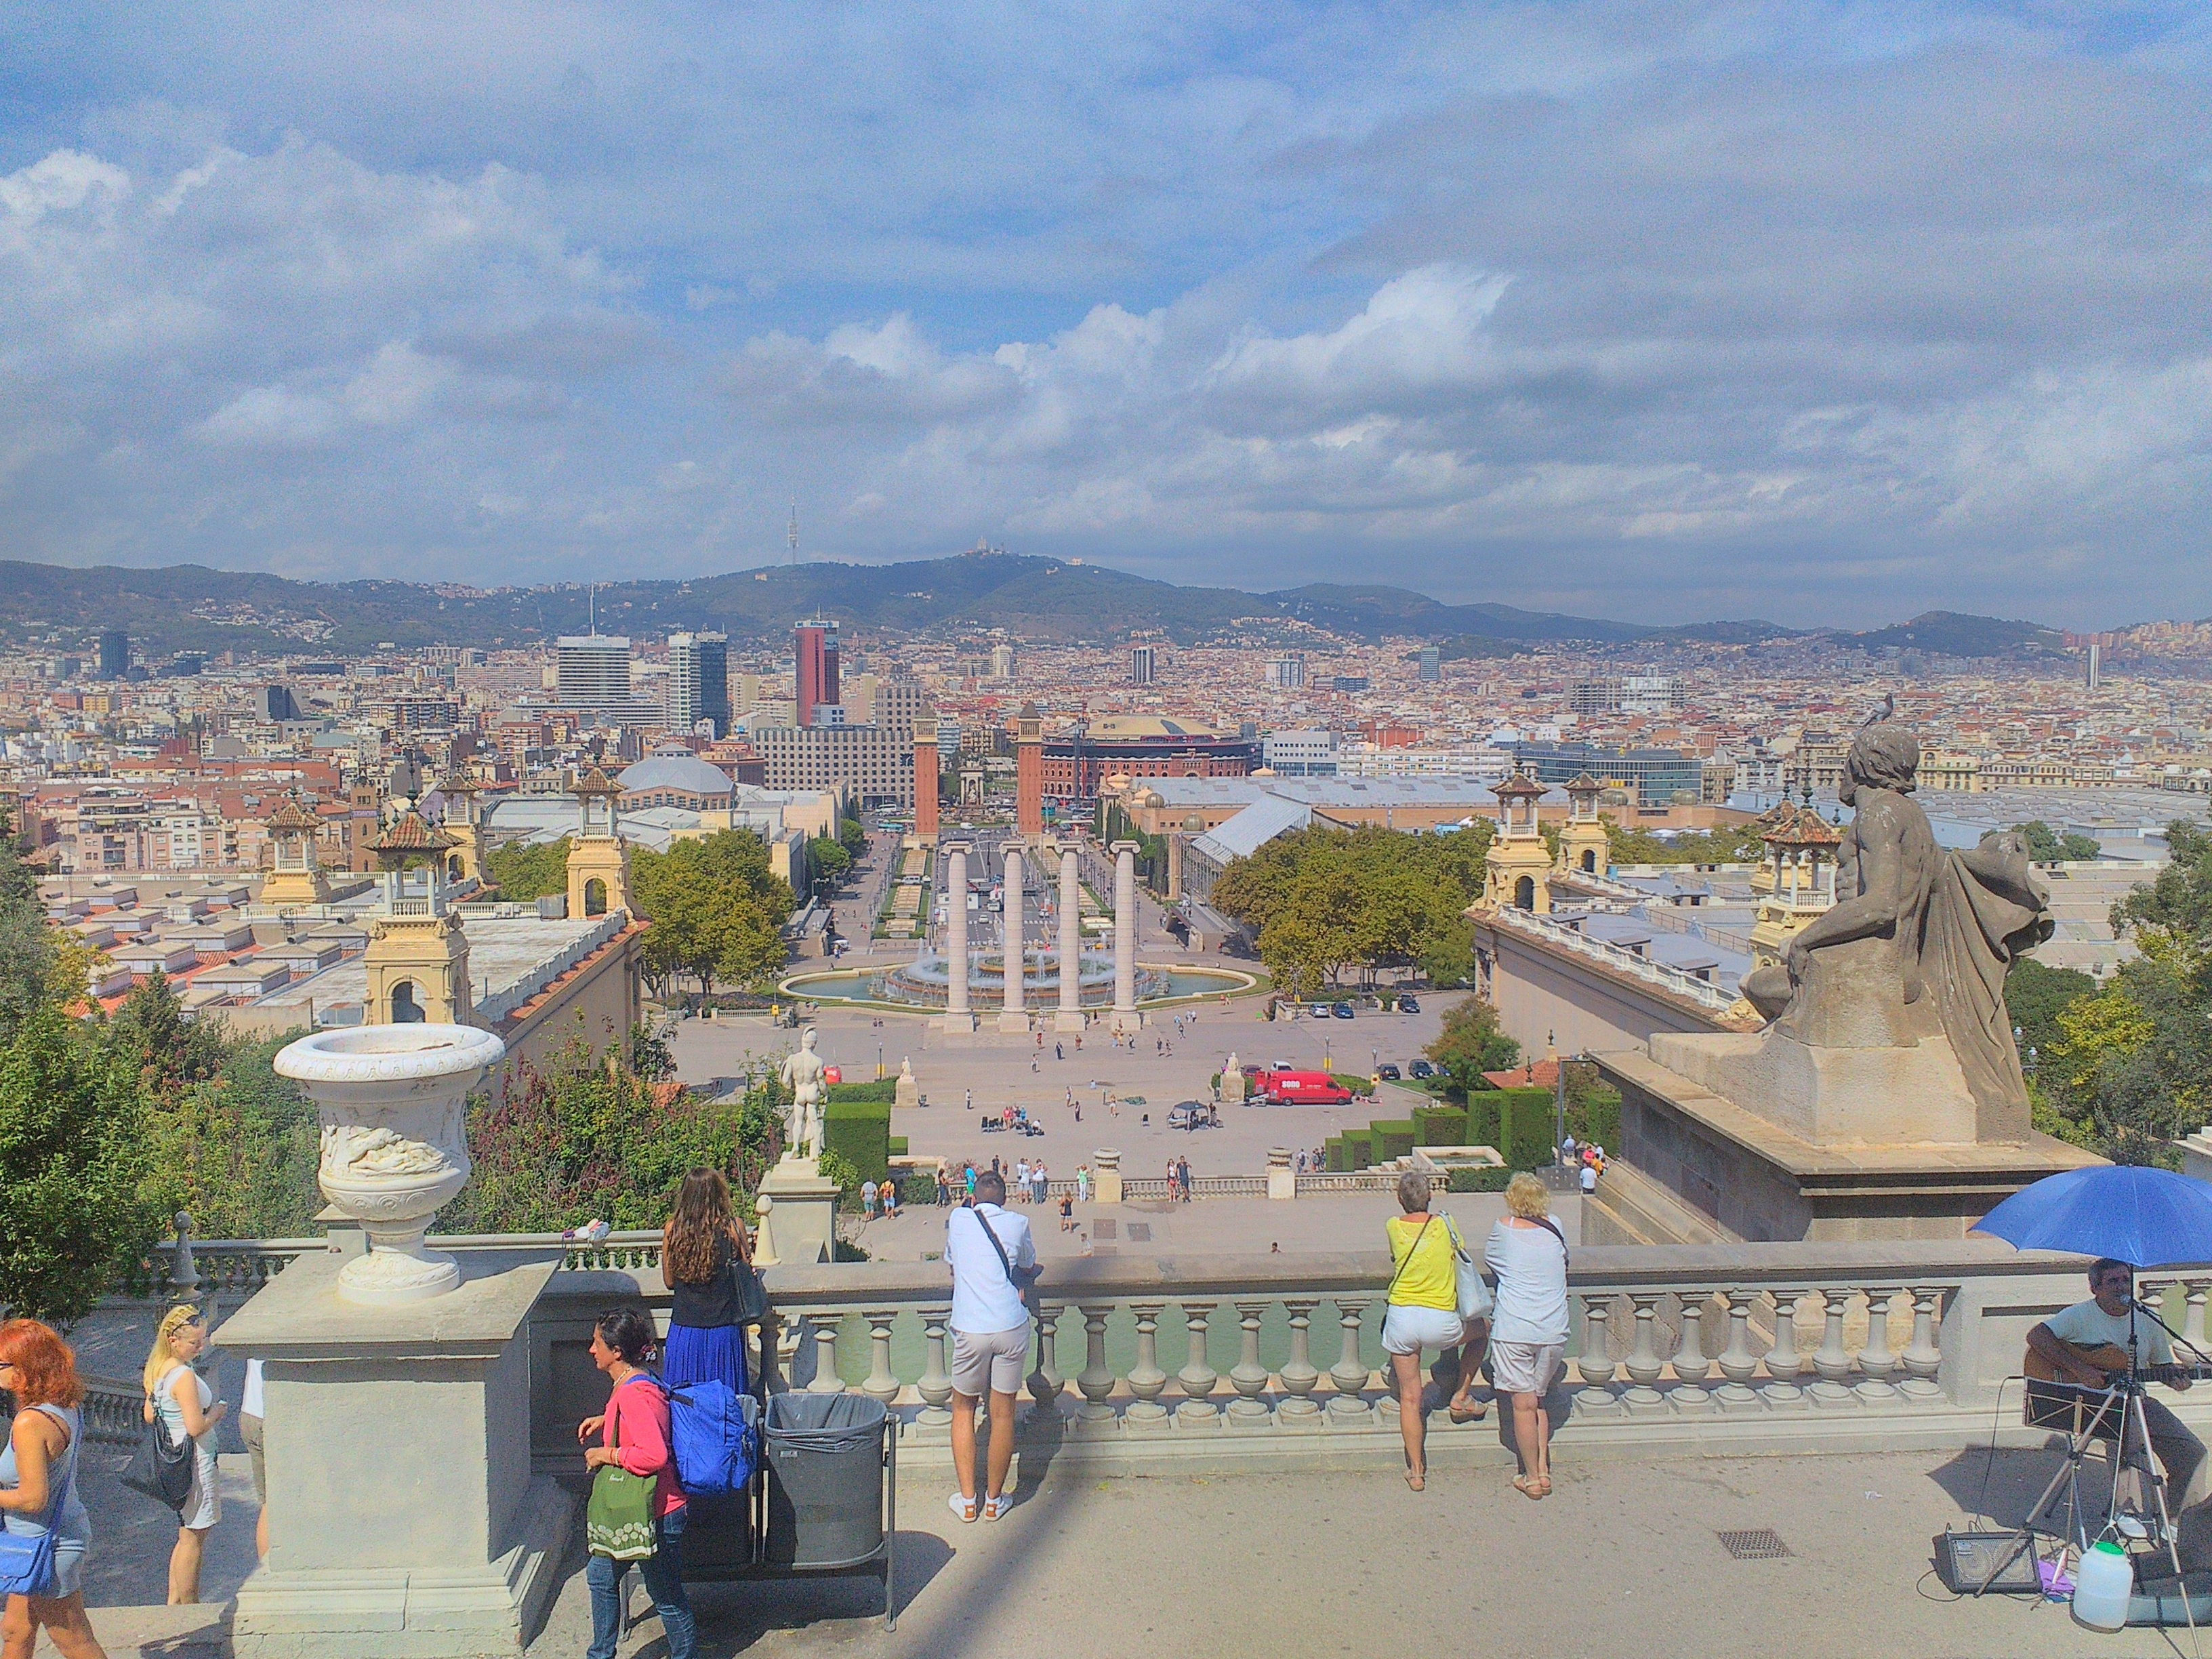 dogadjaji-vesti/letovanje-spanija/spanija-galerija/montjuic-hill-barcelona-spain-3.jpg